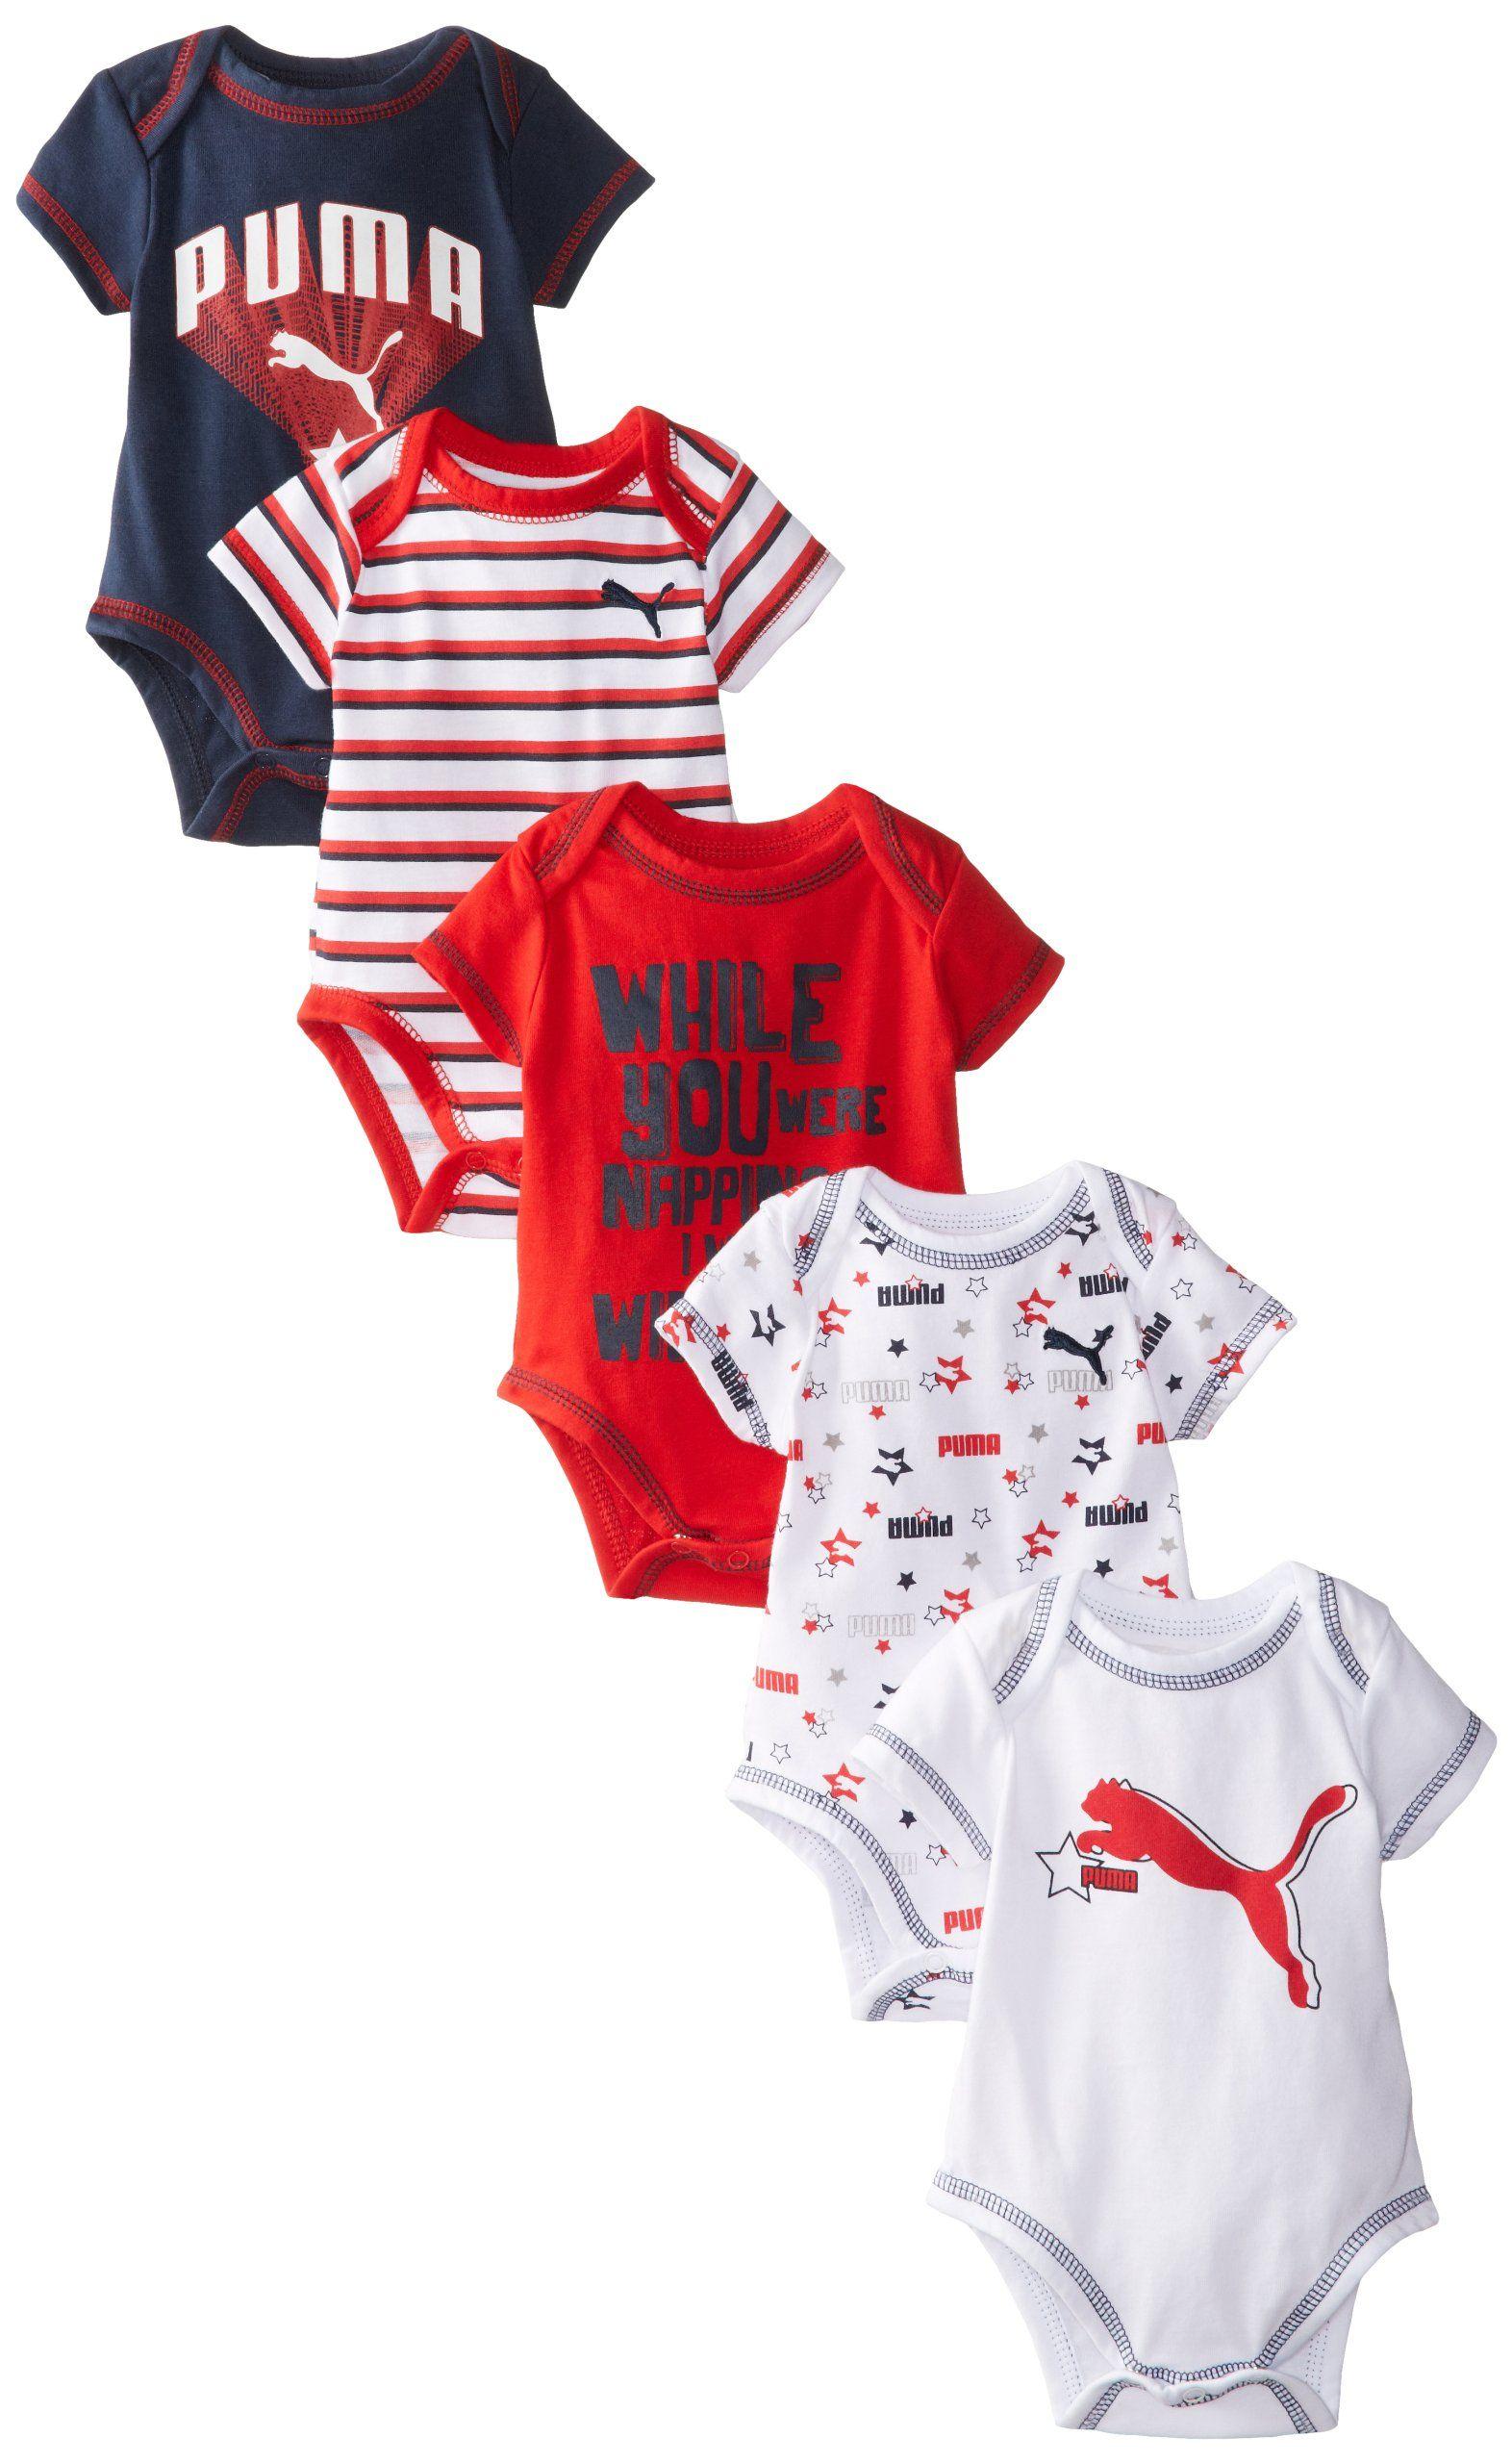 PUMA Baby Boys Newborn 5 Pack Blue Creeper Set Multi 3 6 Months